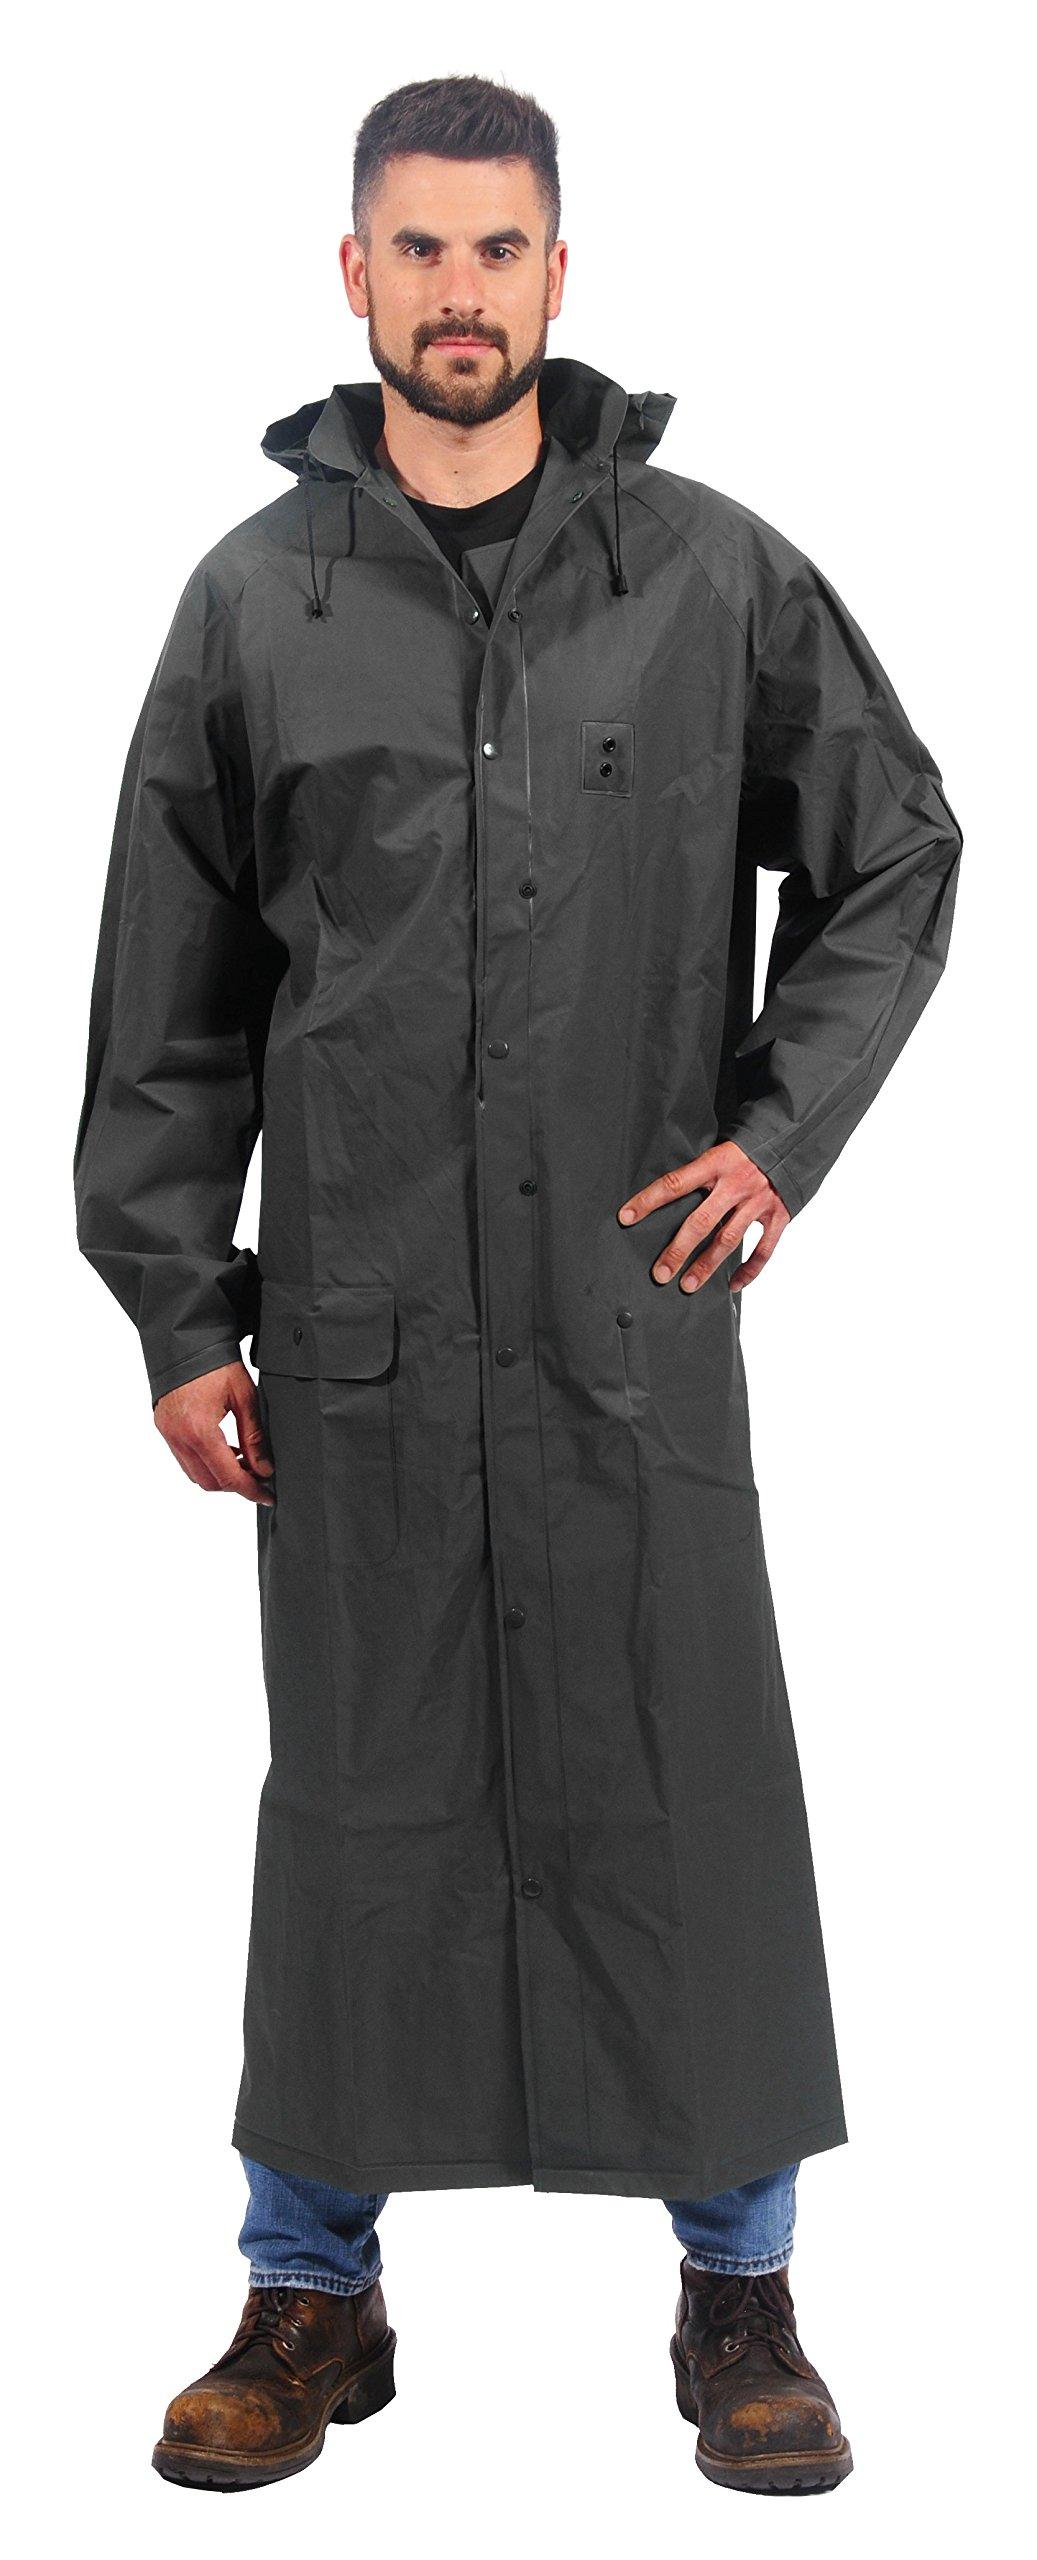 "Galeton 12356-XXL-BK 60"" 0.22 mm Repel Rainwear Eva Ultra-Lightweight Raincoat, 2X-Large, Black"